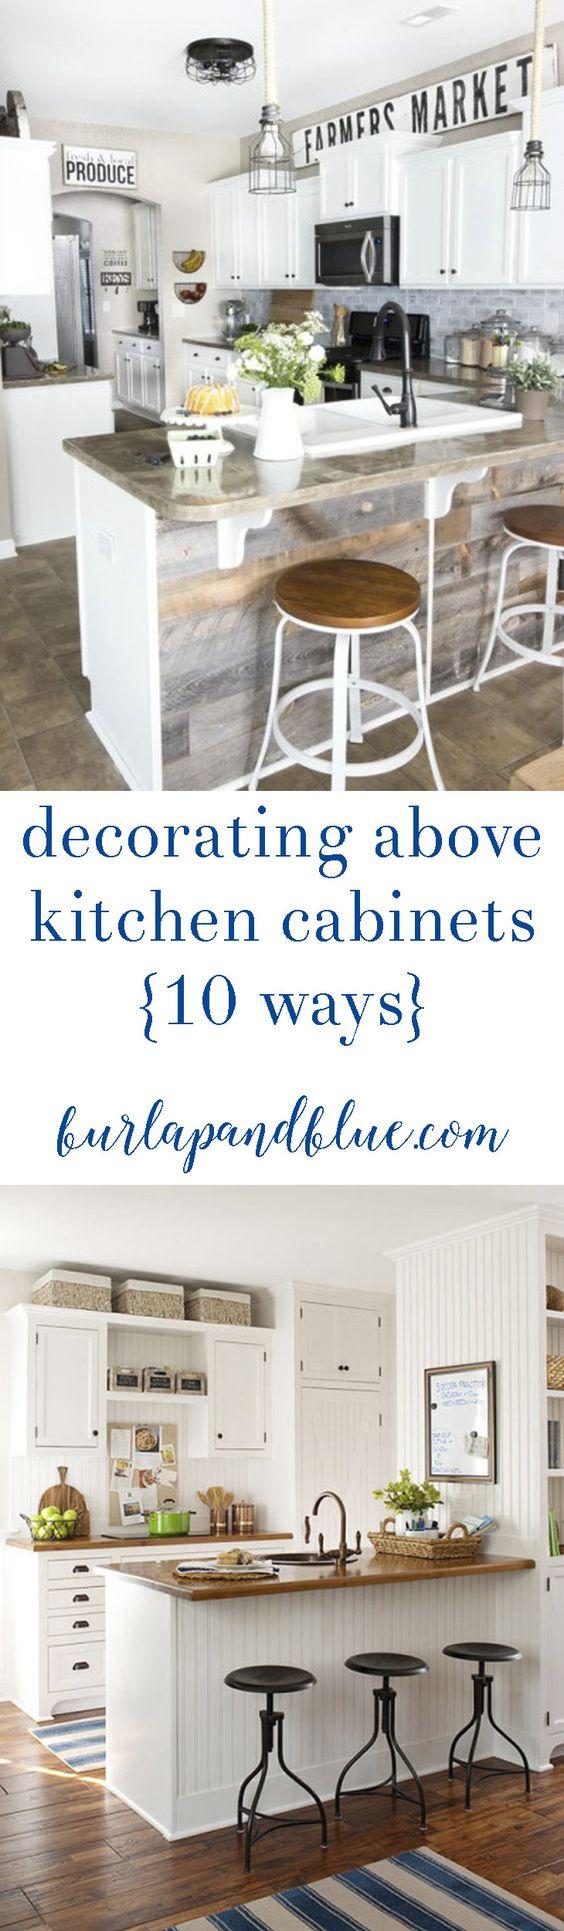 Decor Above Kitchen Cabinets Best 25 Above Cabinet Decor Ideas On Pinterest  Above Kitchen